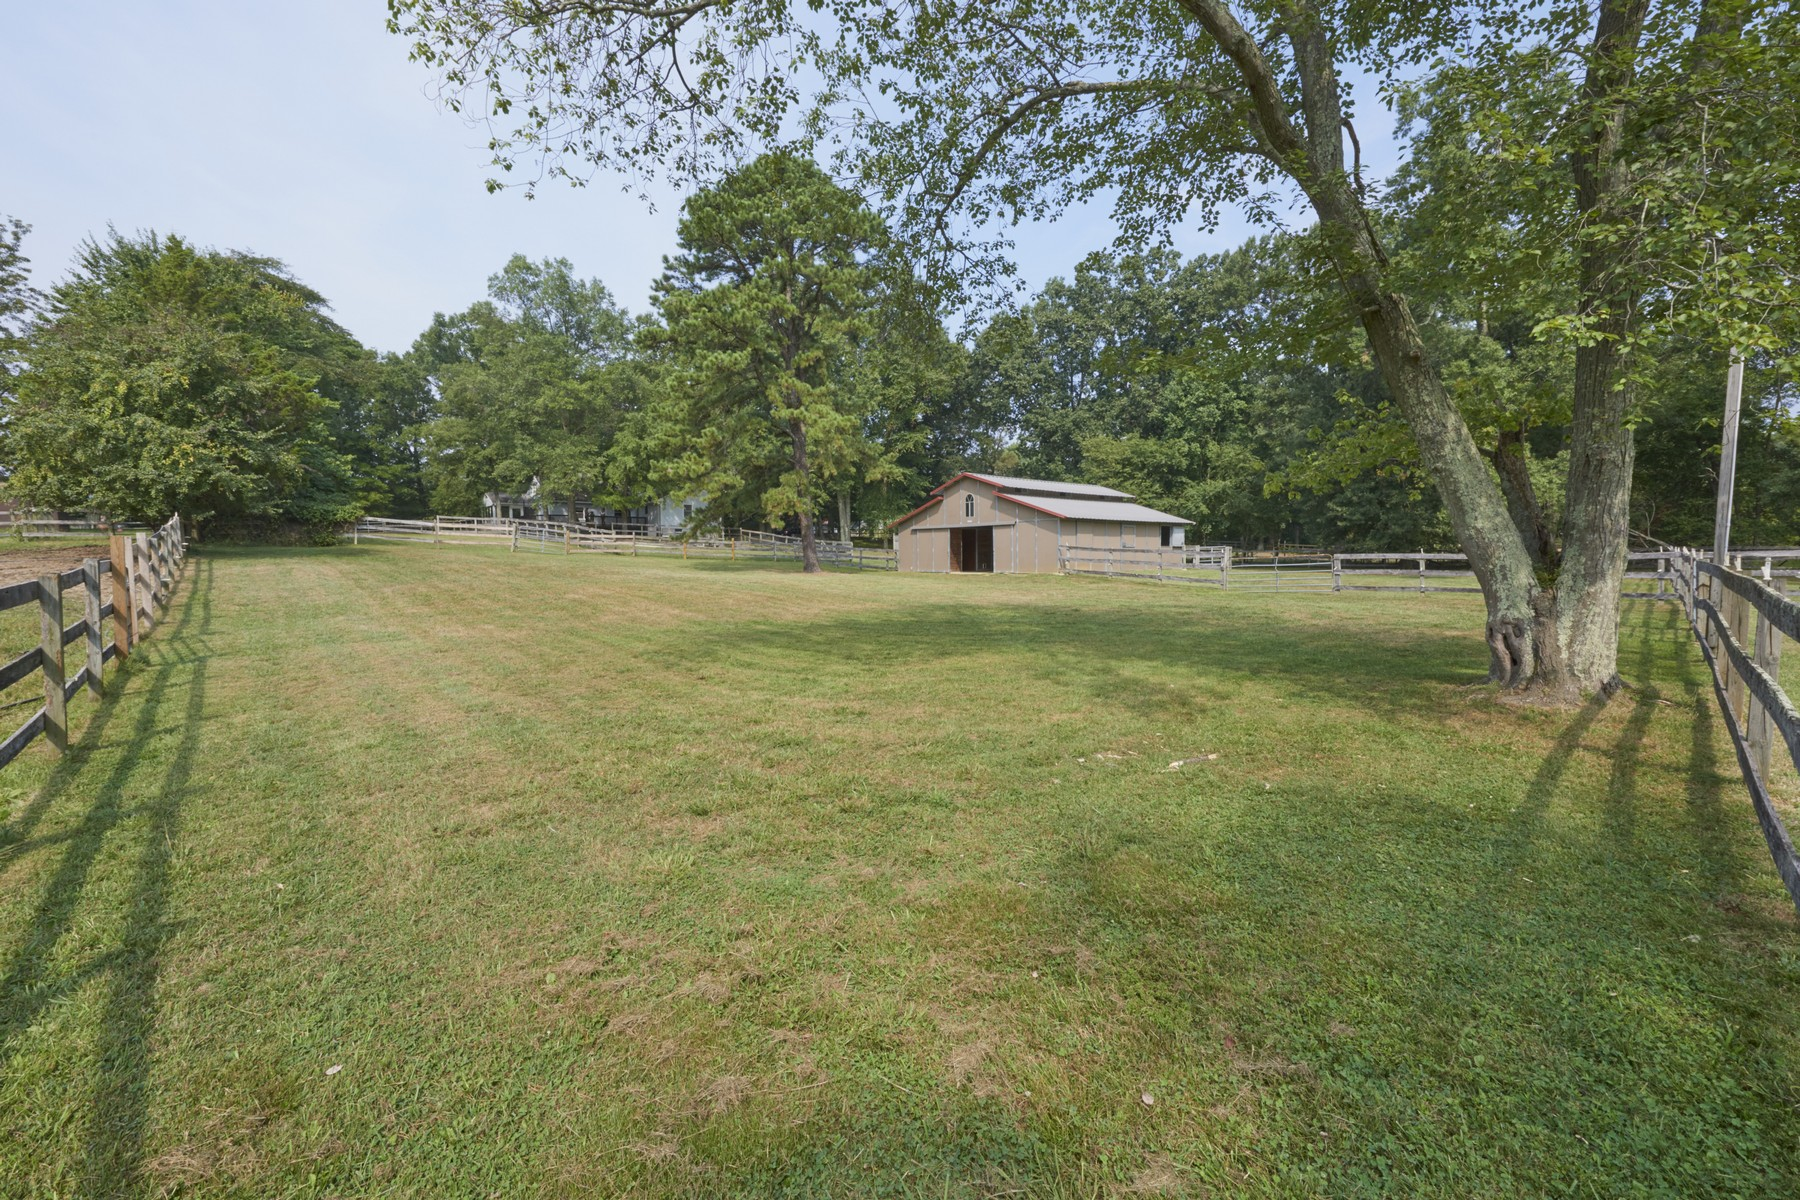 Farm / Ranch / Plantation for Sale at Premier Equestrian Facility 141 Colts Neck Rd Farmingdale, 07727 United States